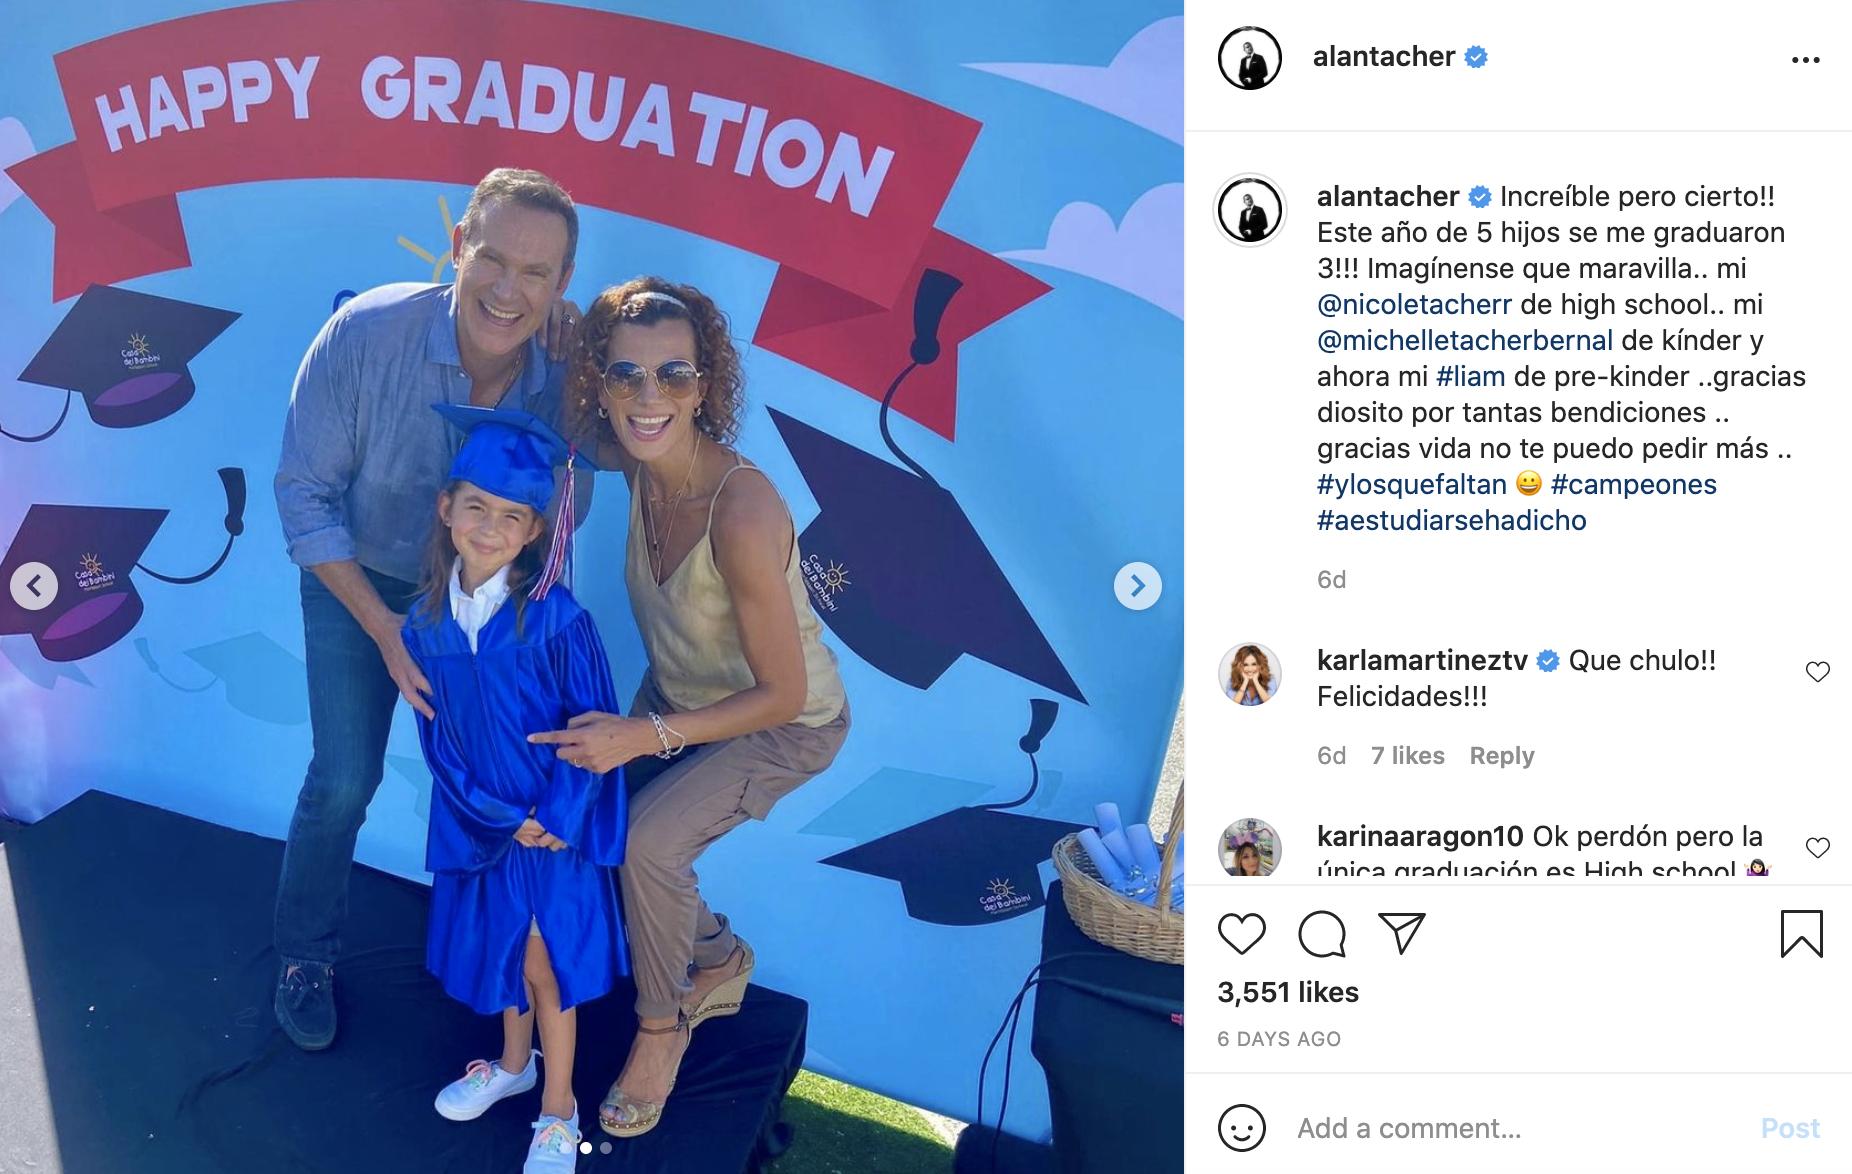 Se gradua Michelle, la hija de Alan Tacher